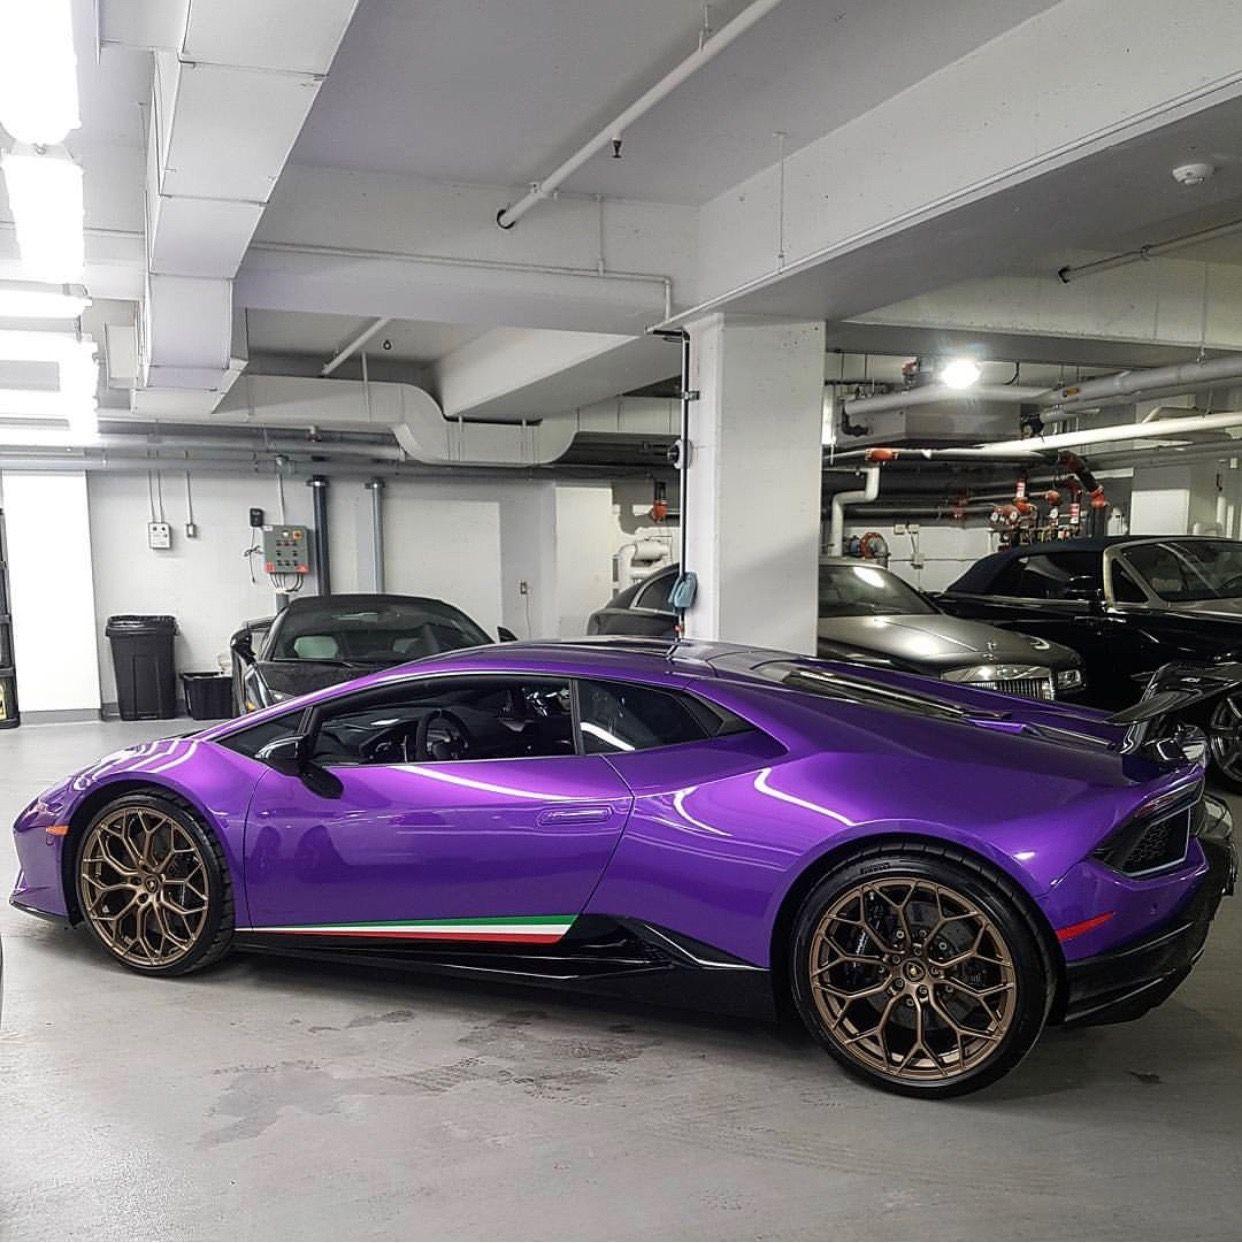 Lamborghini Huracan Performante Painted In Viola Parsifae W/ Tricolore  Stripes Along The Doors Photo Taken